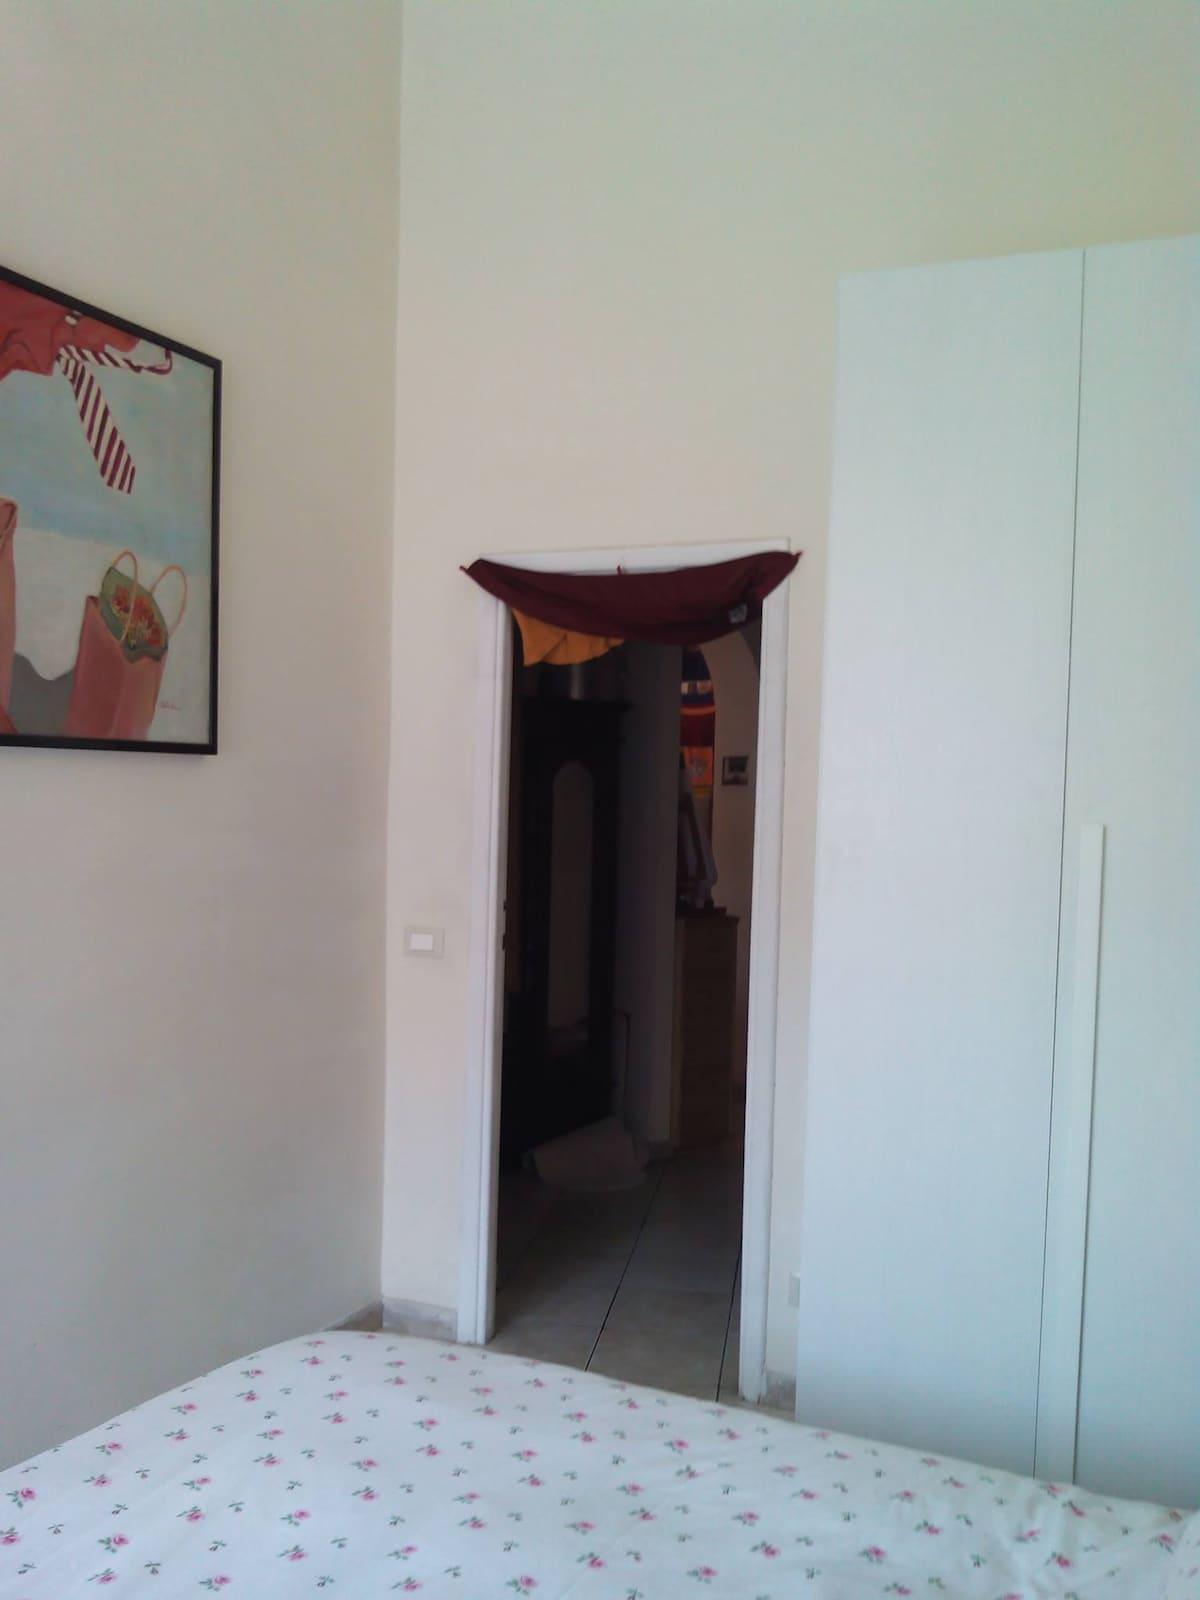 Door out of the room